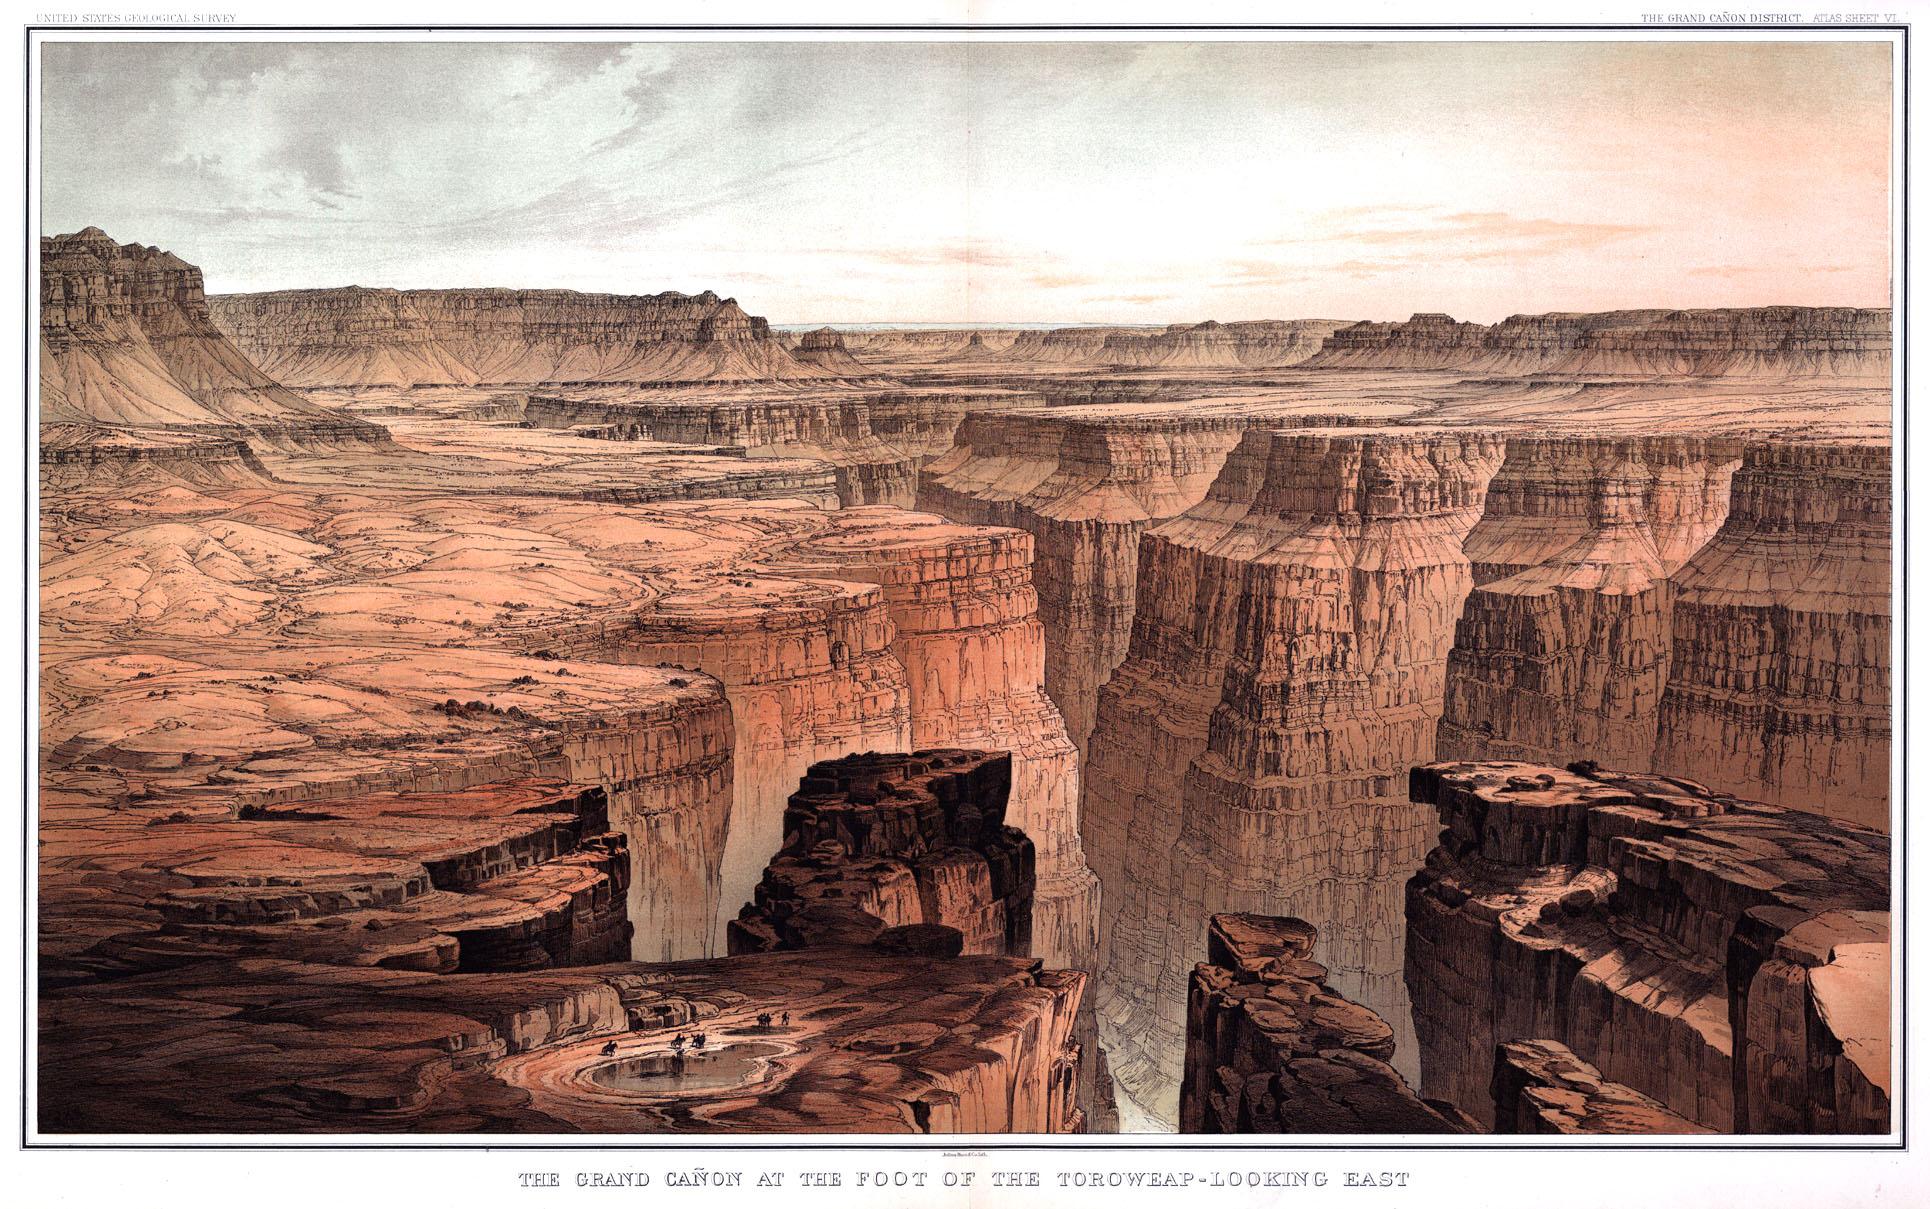 e89a679238 History of the Grand Canyon area - Wikipedia